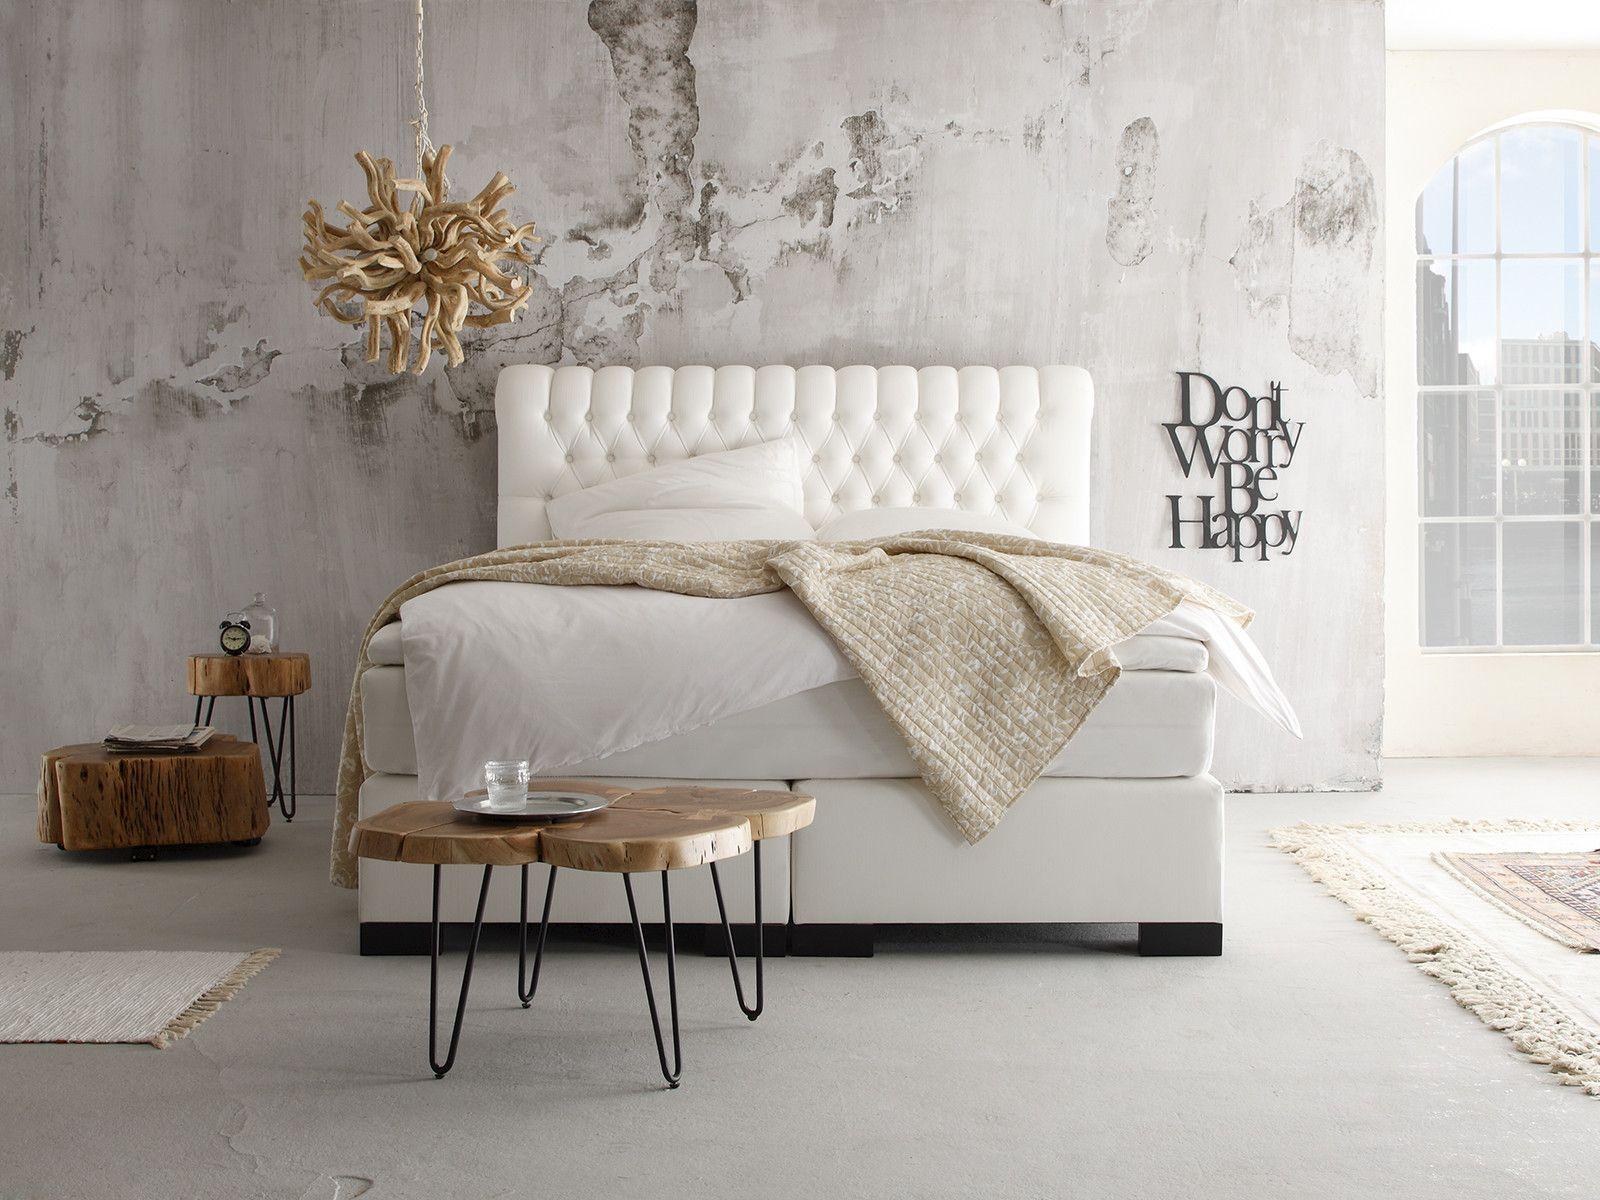 Poster Schlafzimmer ~ 64 best schlafzimmer images on pinterest bedroom abdominal